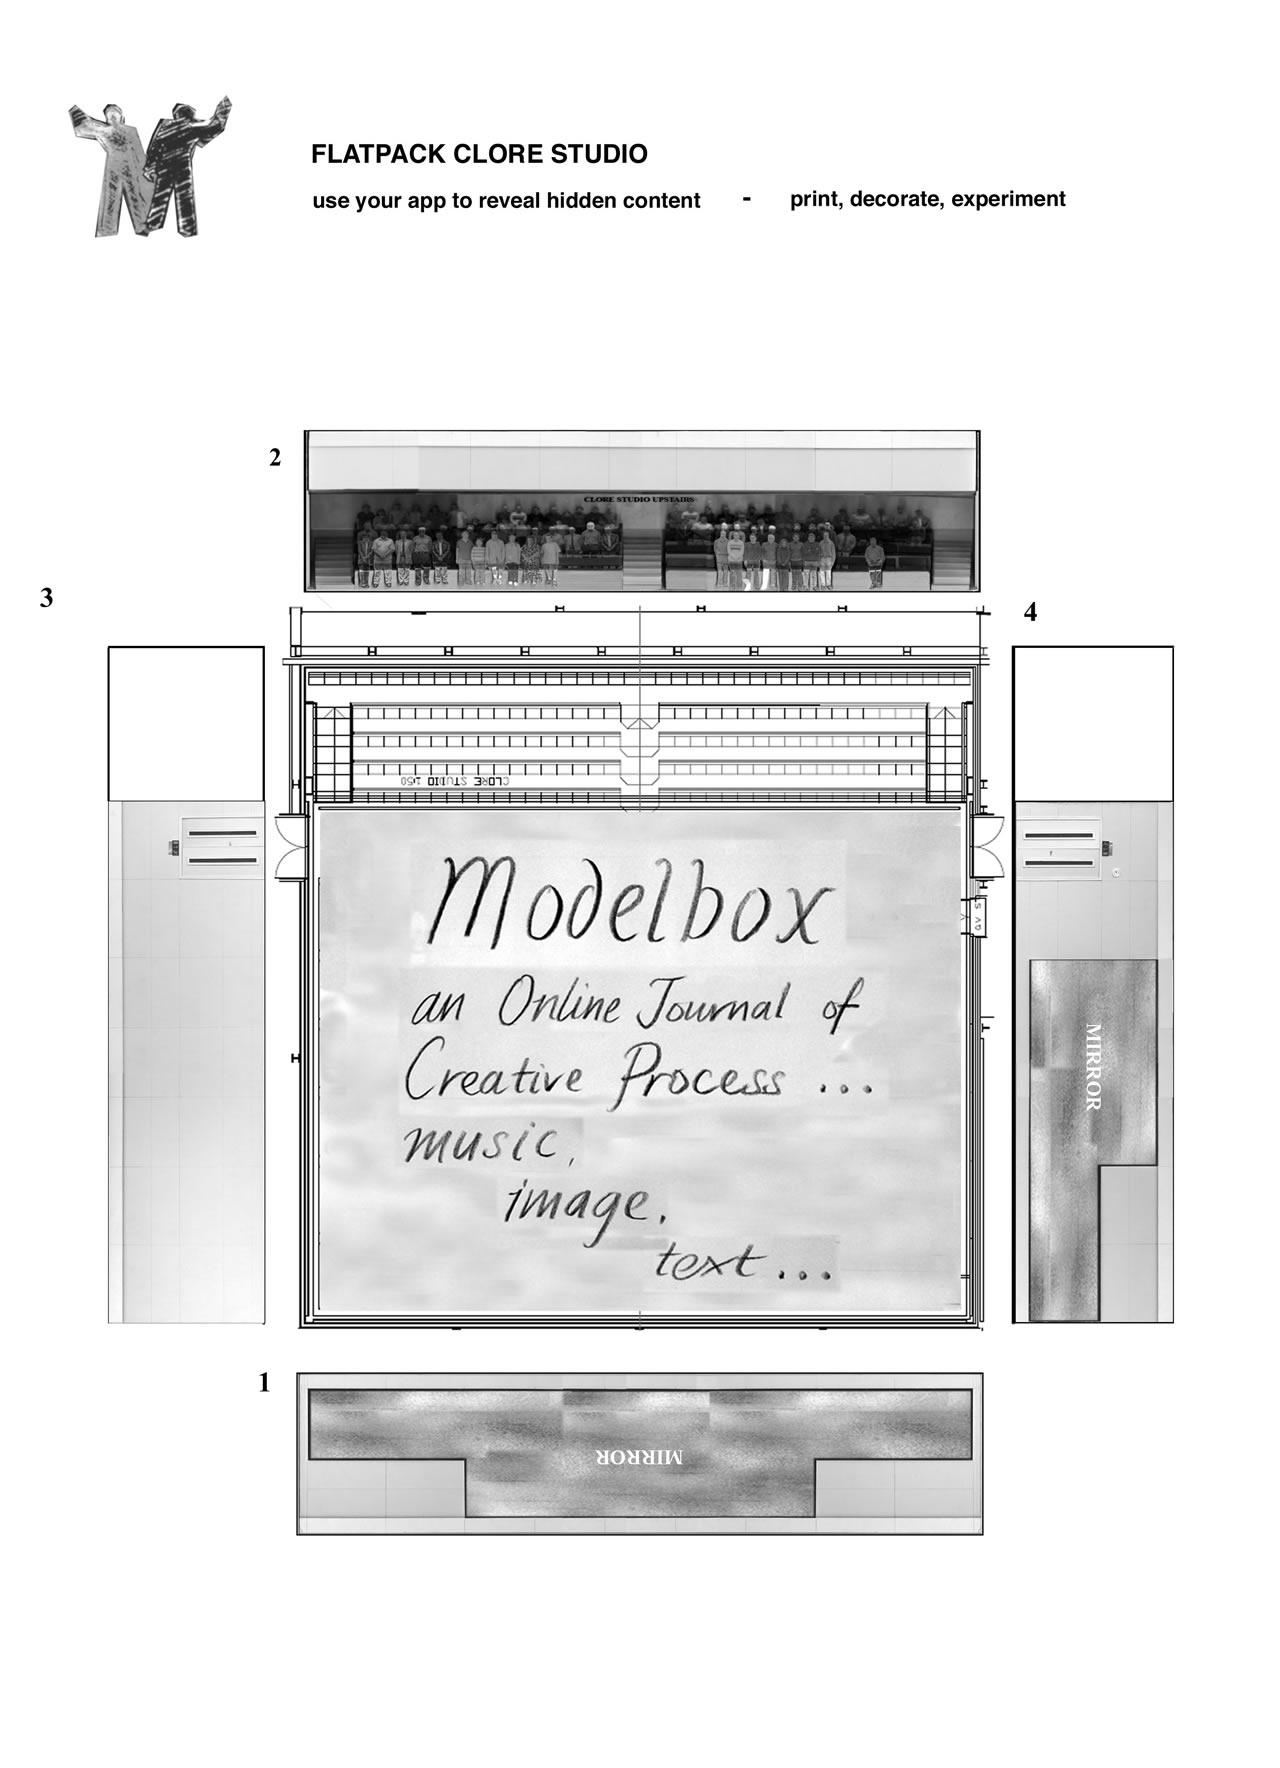 modelbox-flatpack